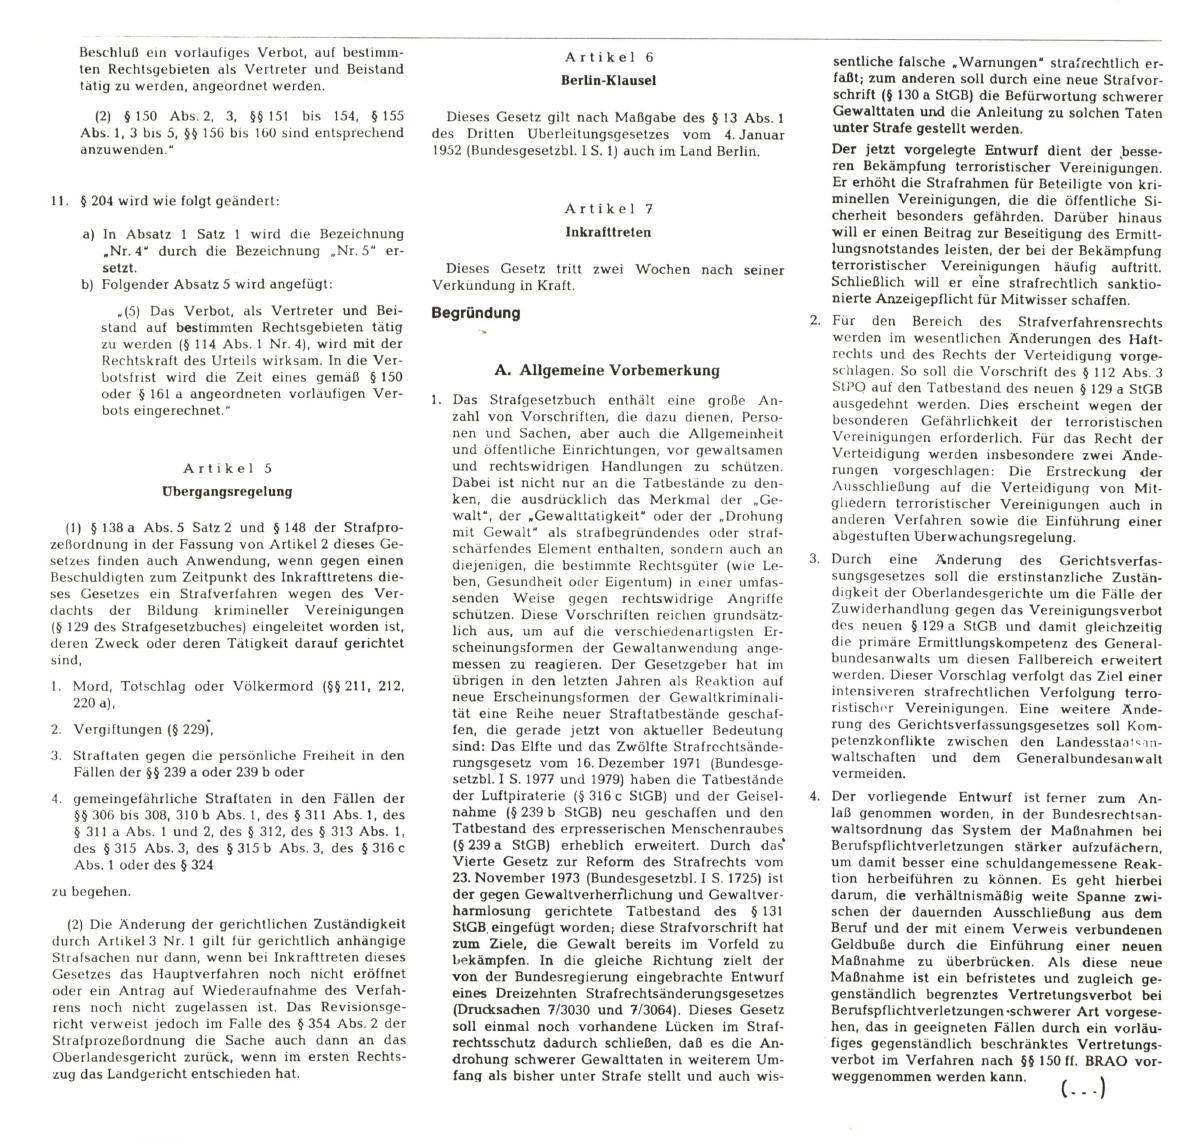 REP_VLB_1976_Die_Zensurgesetze_61